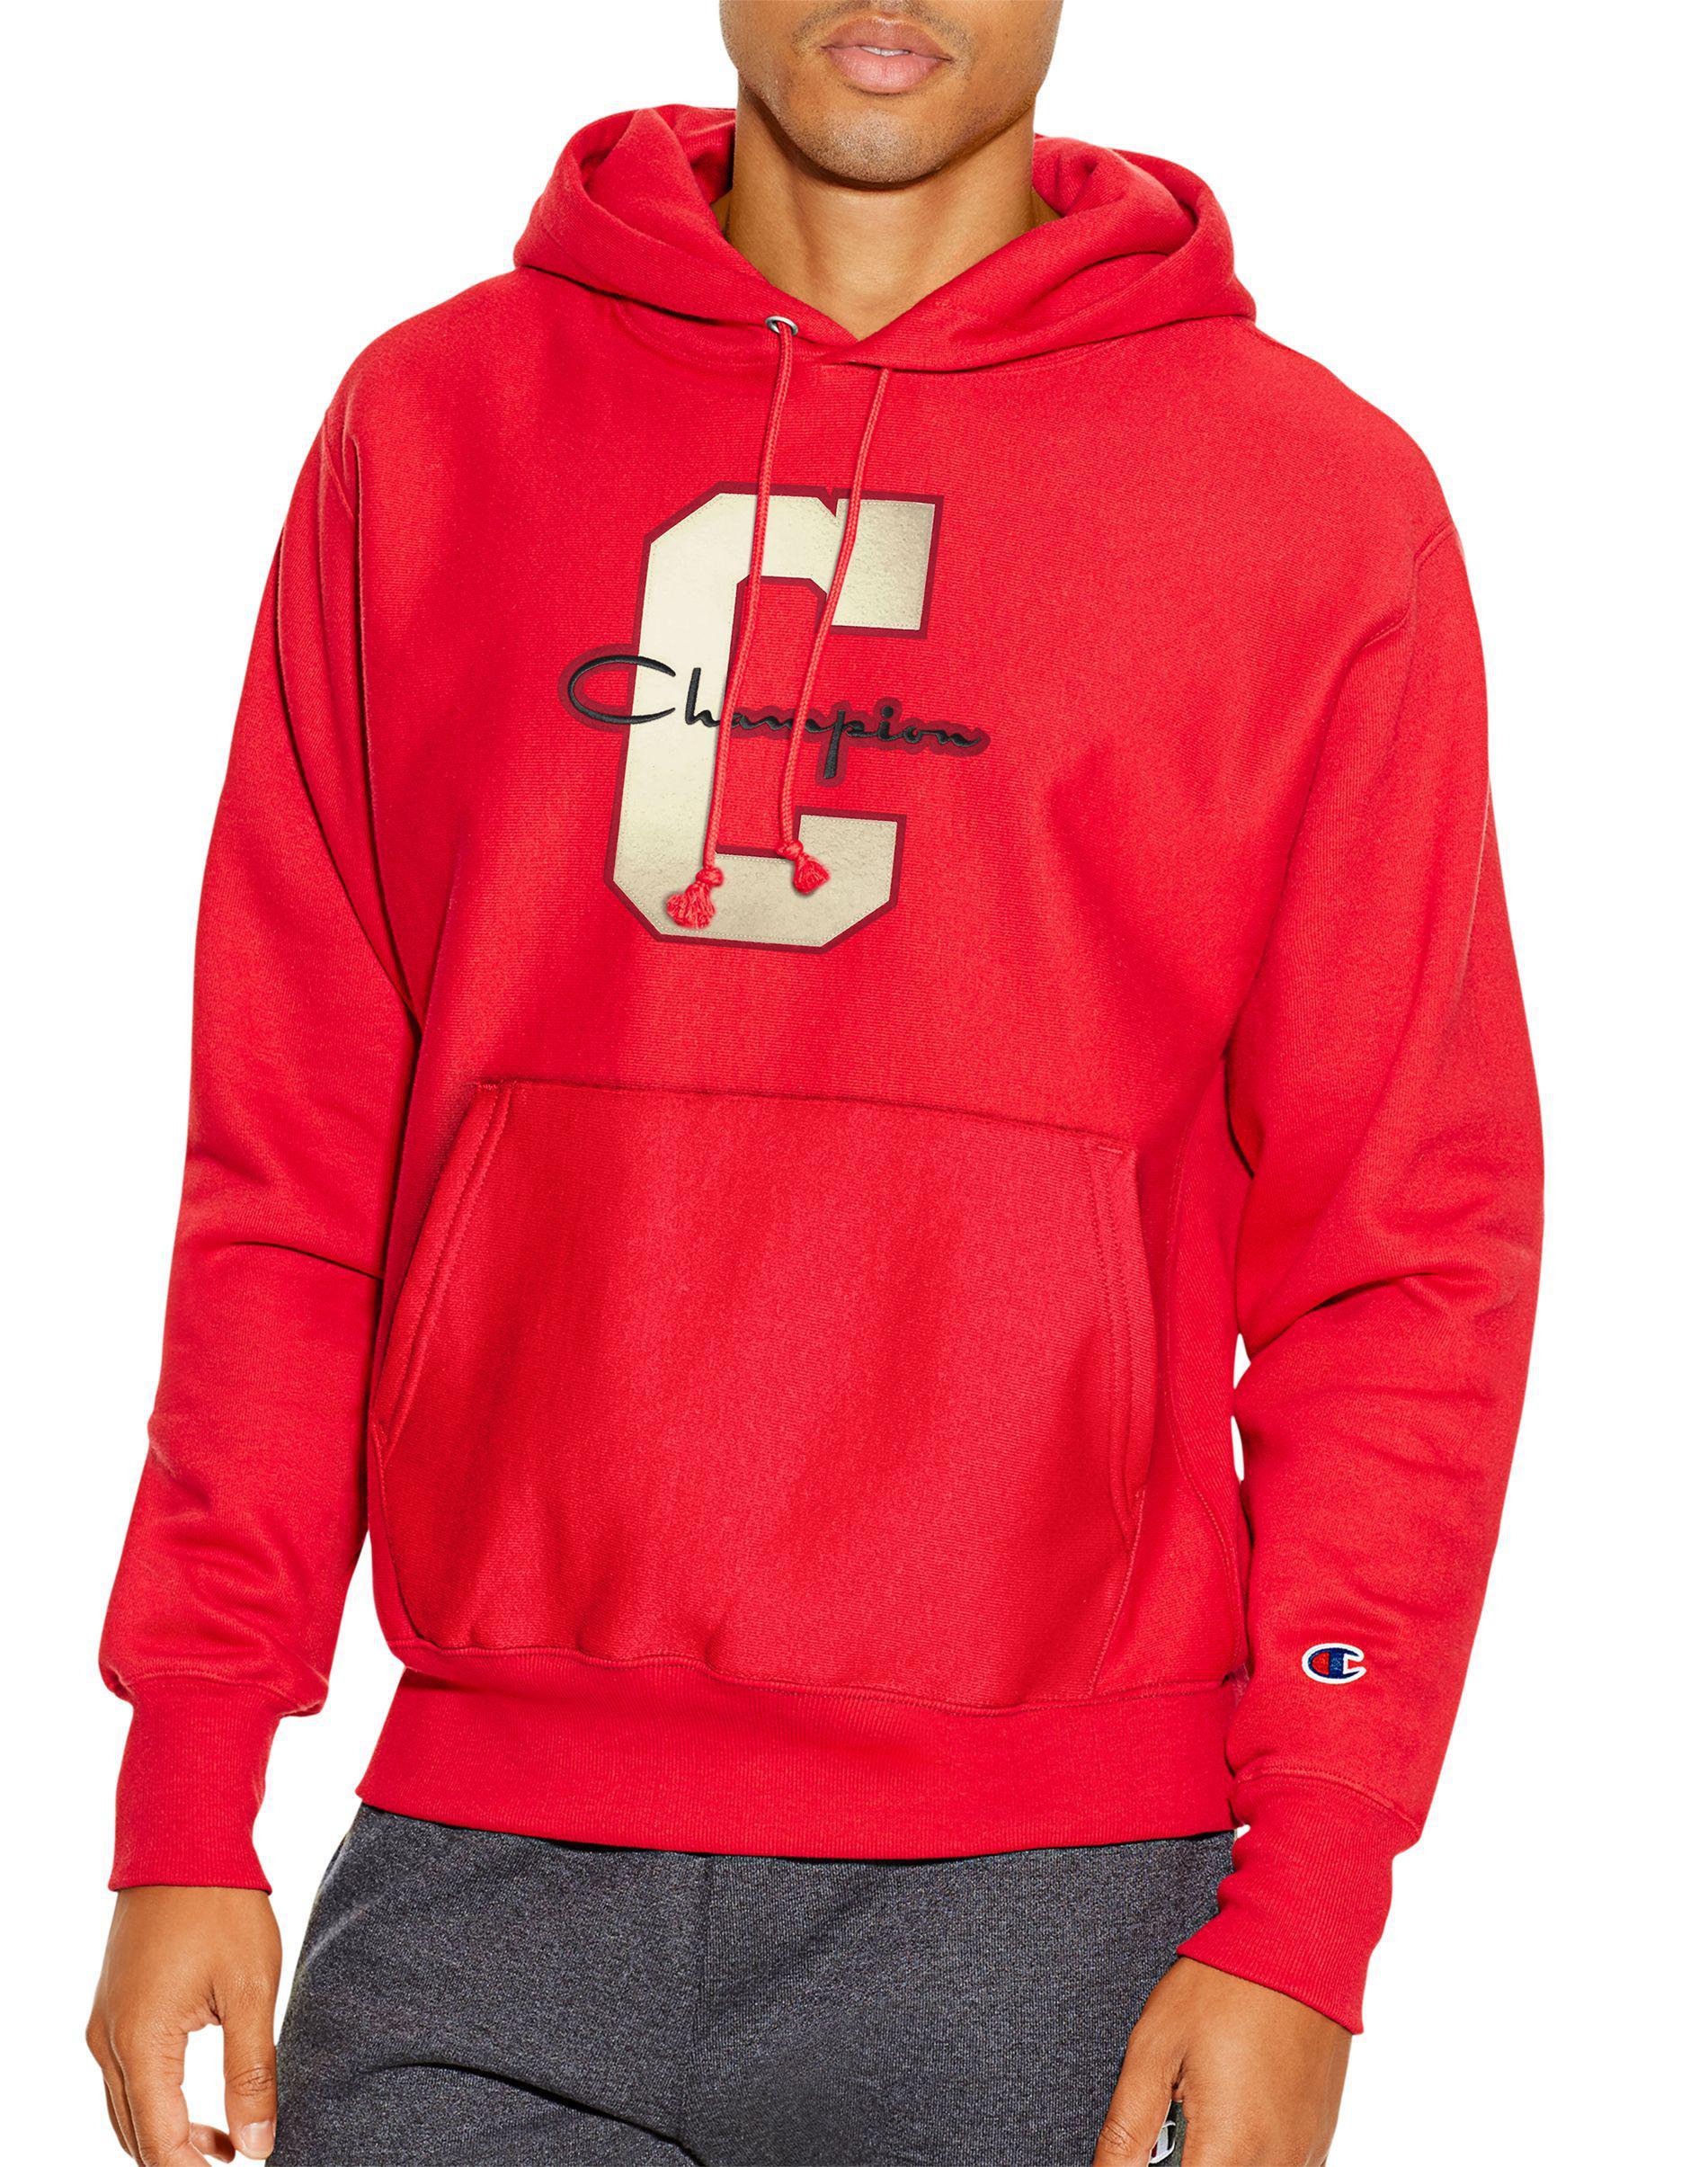 c1daa7c4b Champion. Men s Red Life® Reverse Weave® Pullover Hoodie